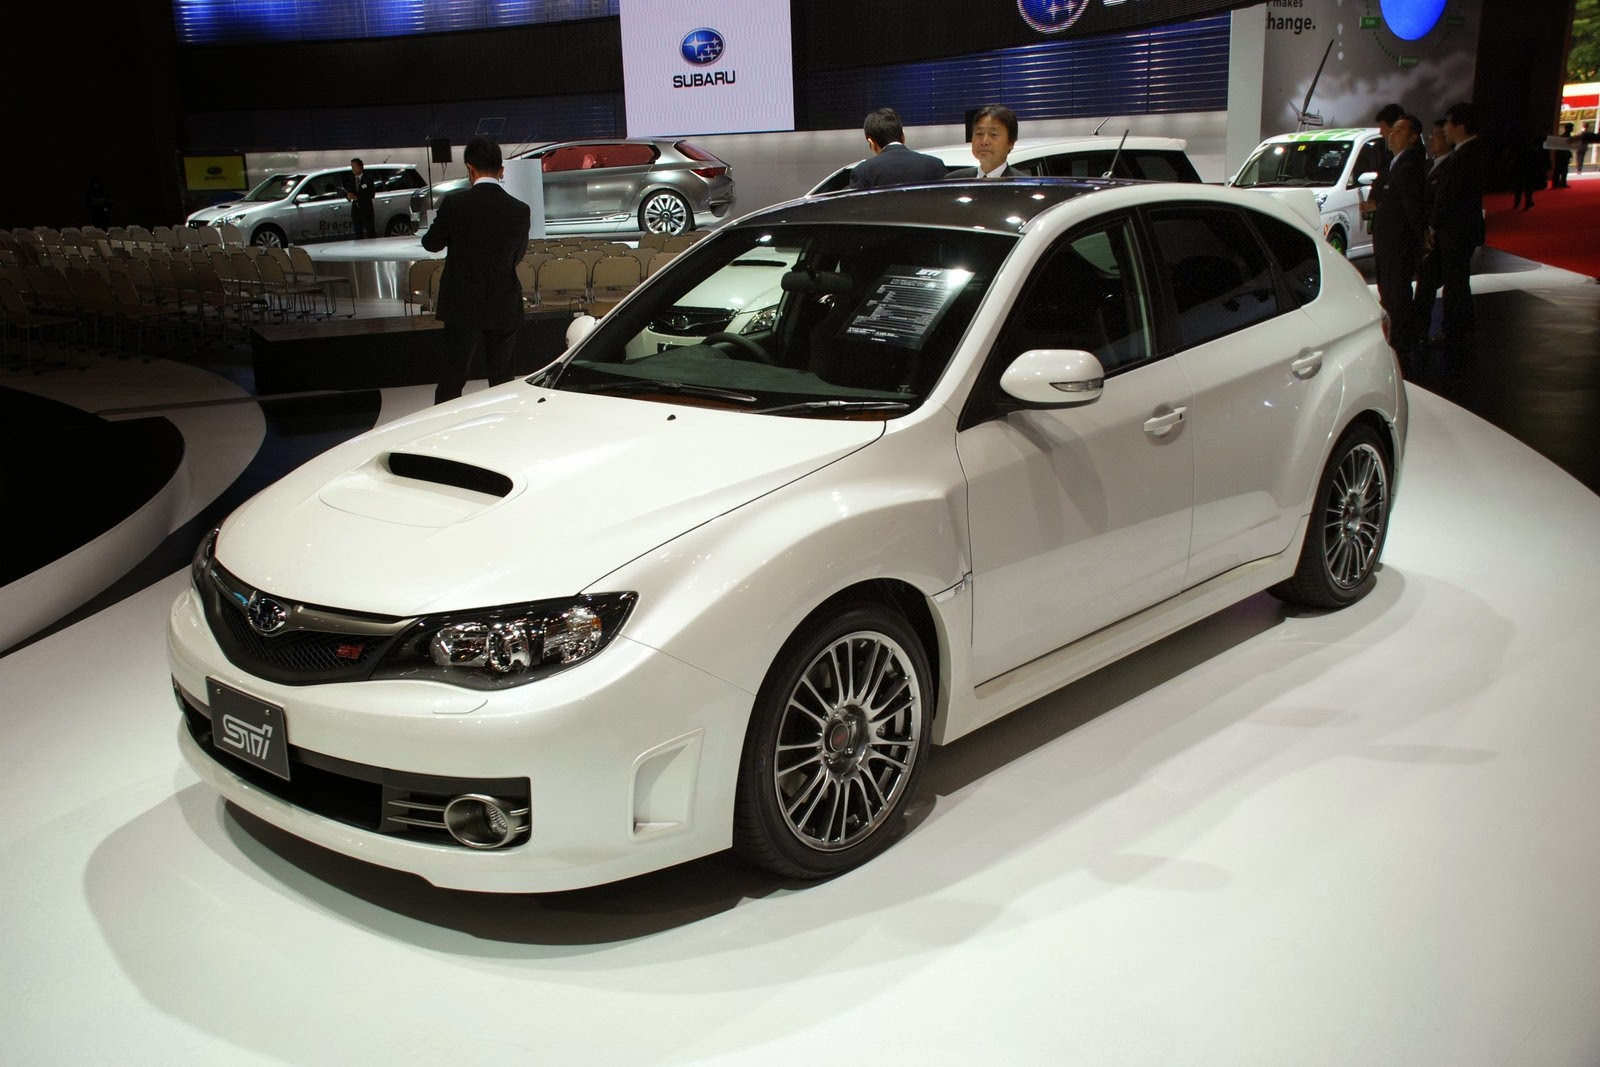 Subaru Impreza WRX STI Carbon 2014 Wallpaper 1600x1067